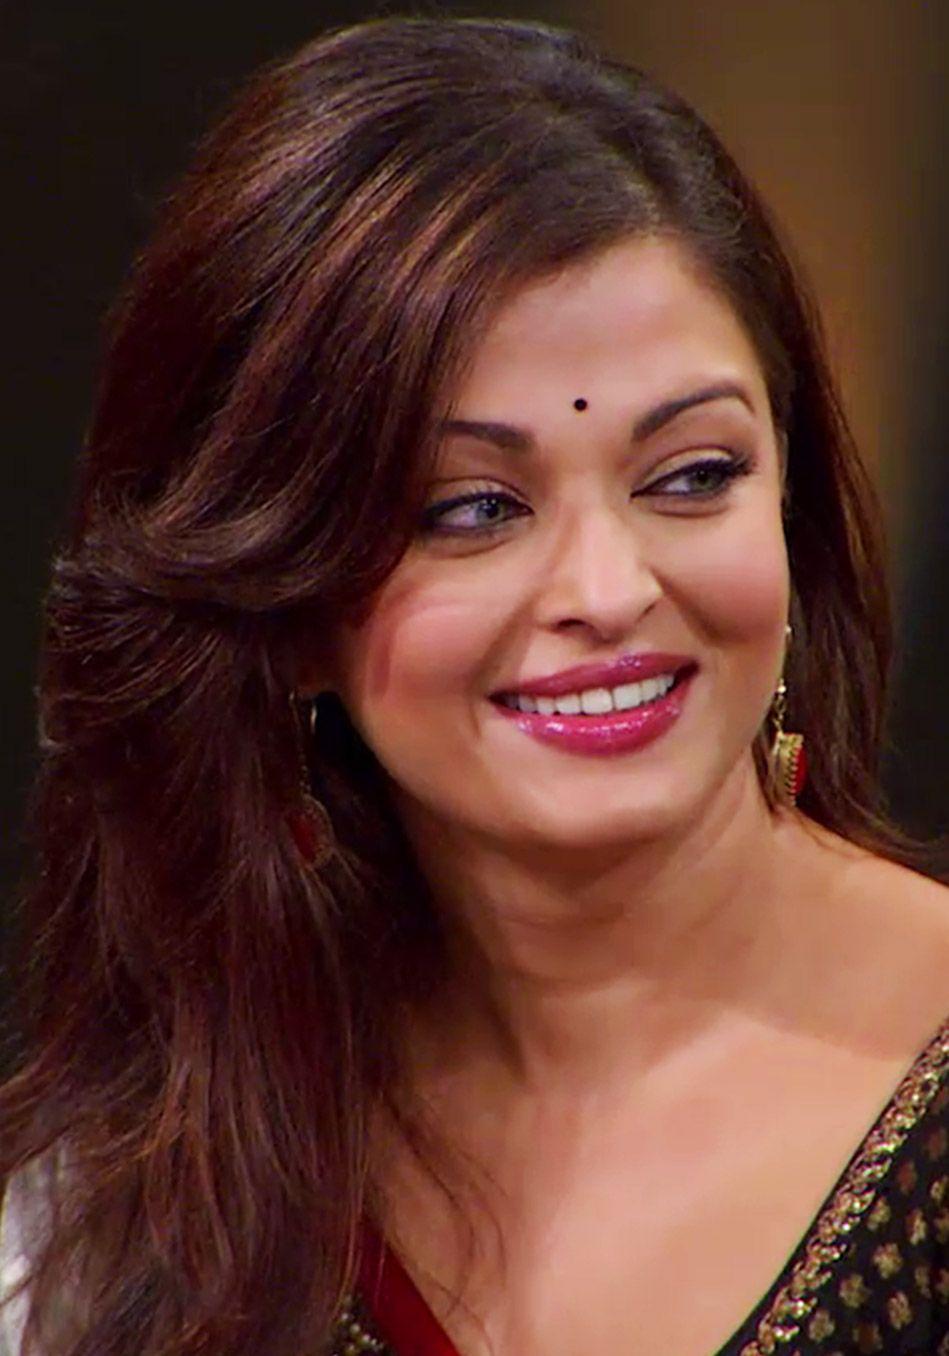 Aishwarya Rai And Abhishek Bachchan S First Television Interview As A Couple Beautiful Face Beauty Girl Aishwarya Rai